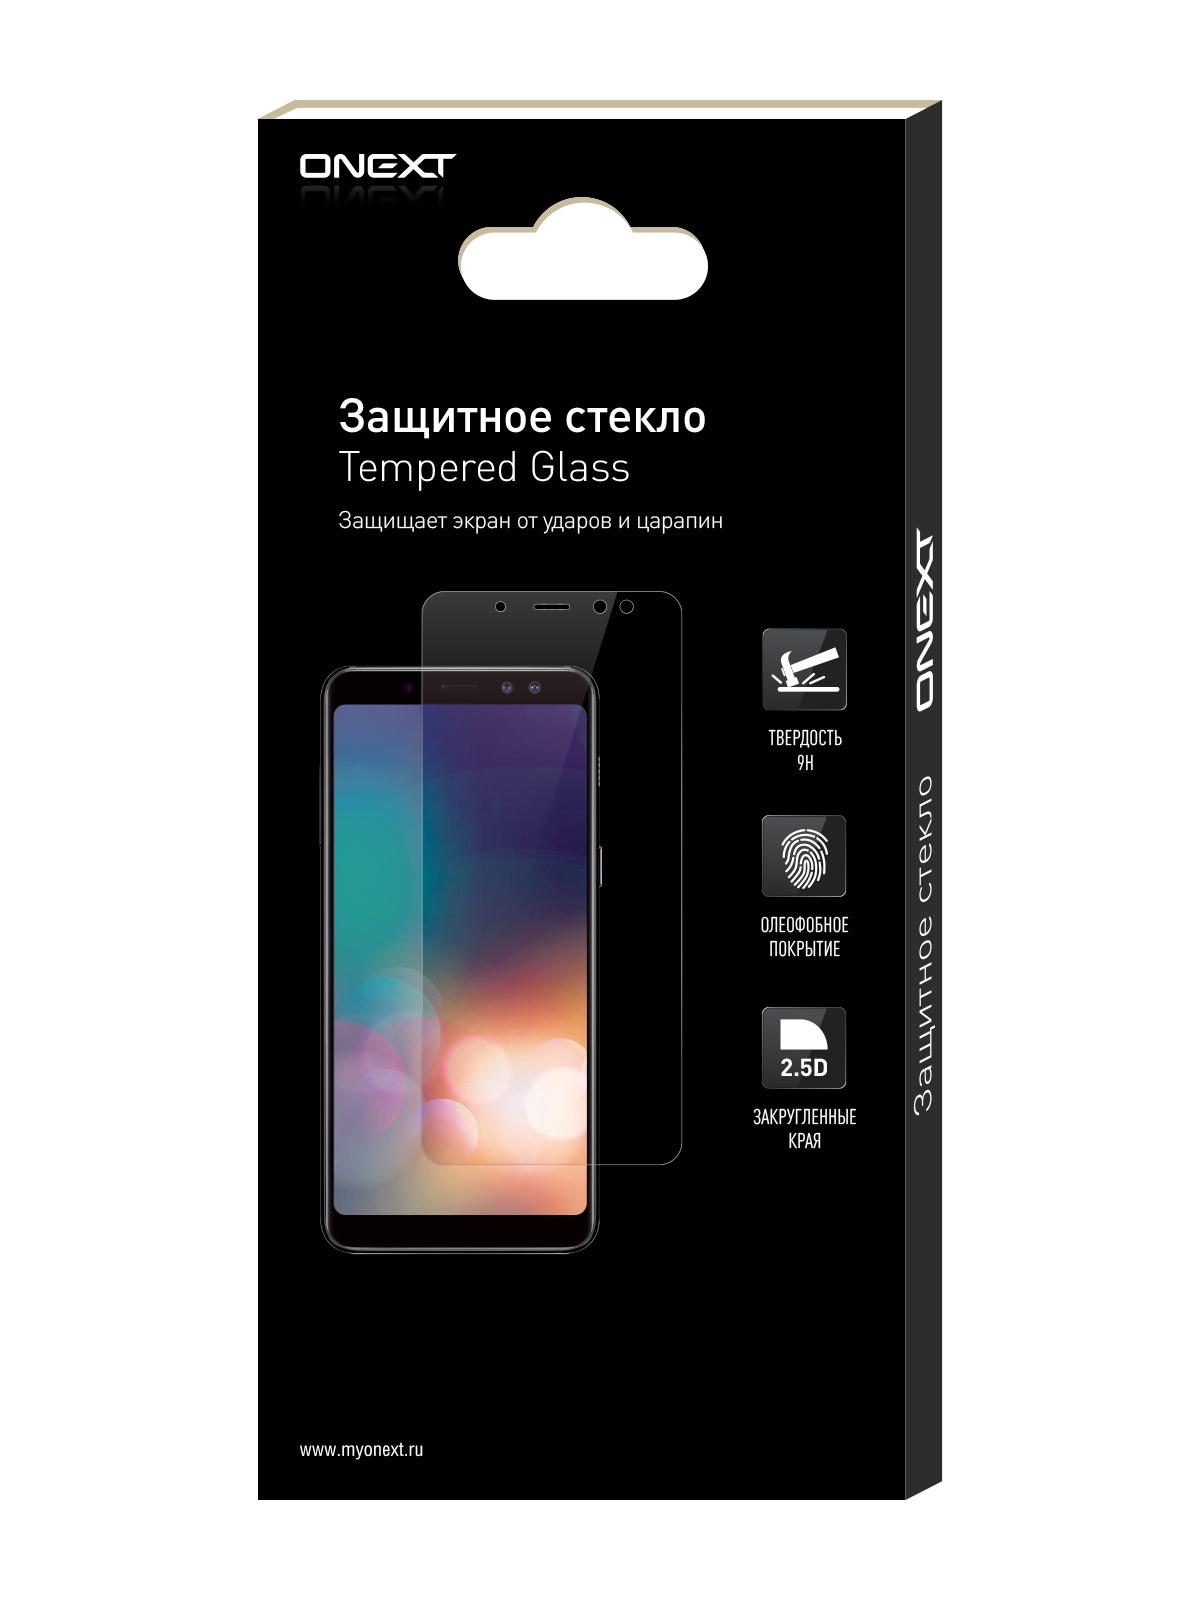 Защитное стекло ONEXT Samsung Galaxy J5 2016 защитное стекло для samsung galaxy j5 2016 sm j510fn onext